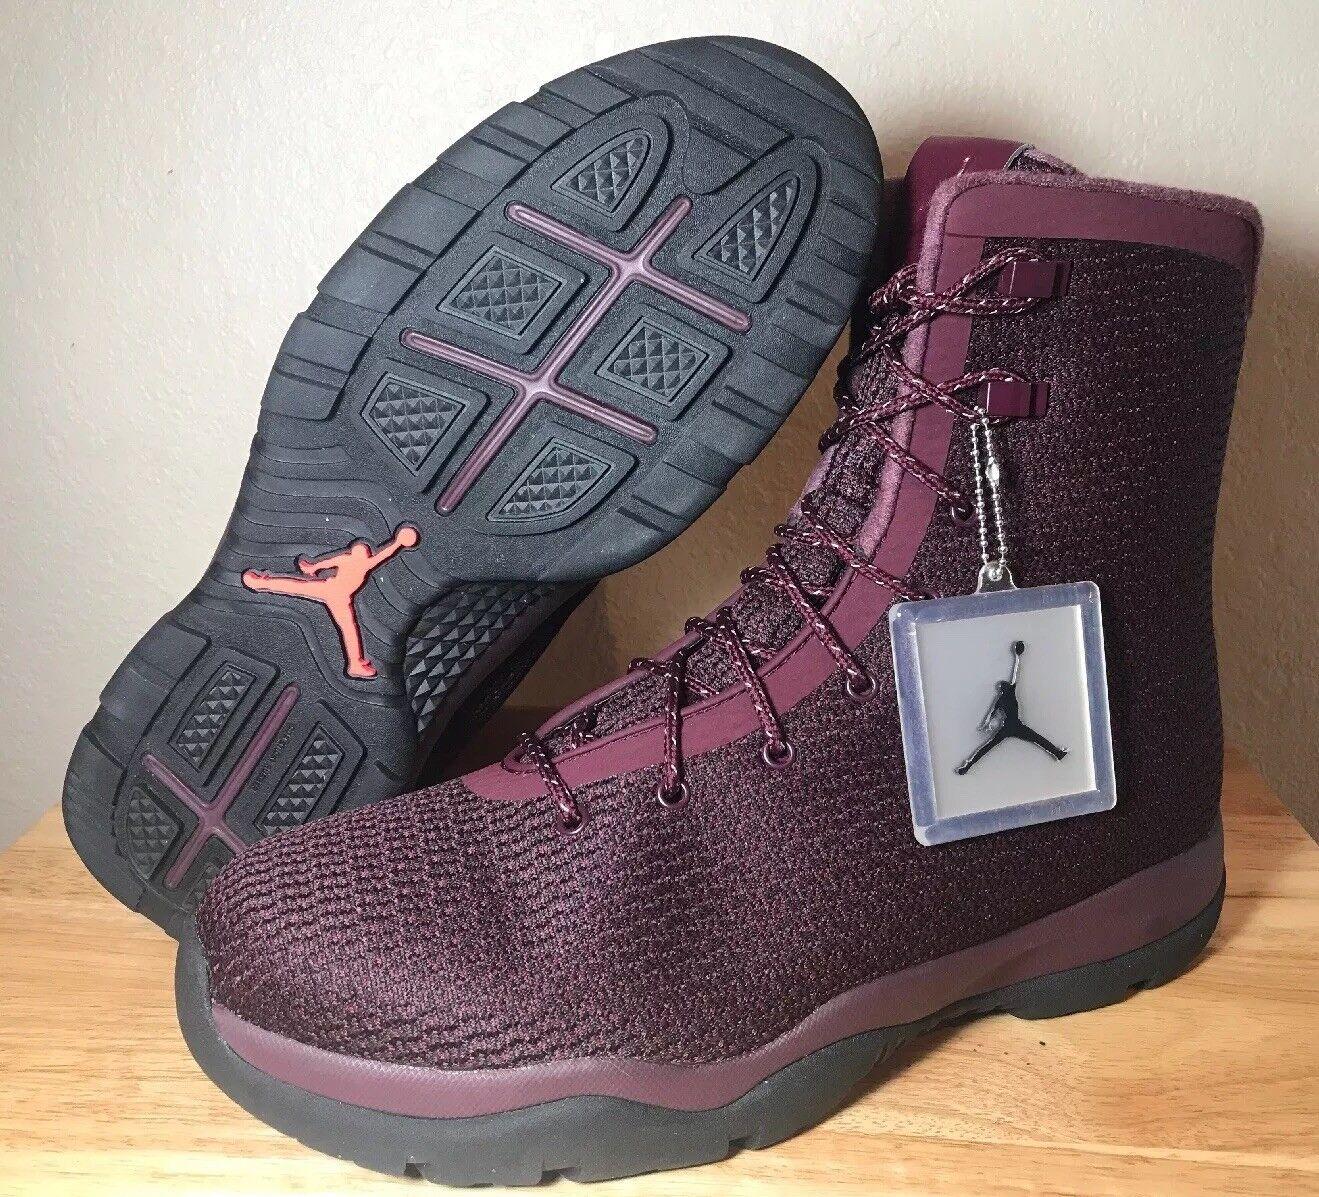 c8f934d5598a Nike Air Jordan Future Future Future Boots Size 12 Maroon Burgundy Black  Boots Mens 854554-